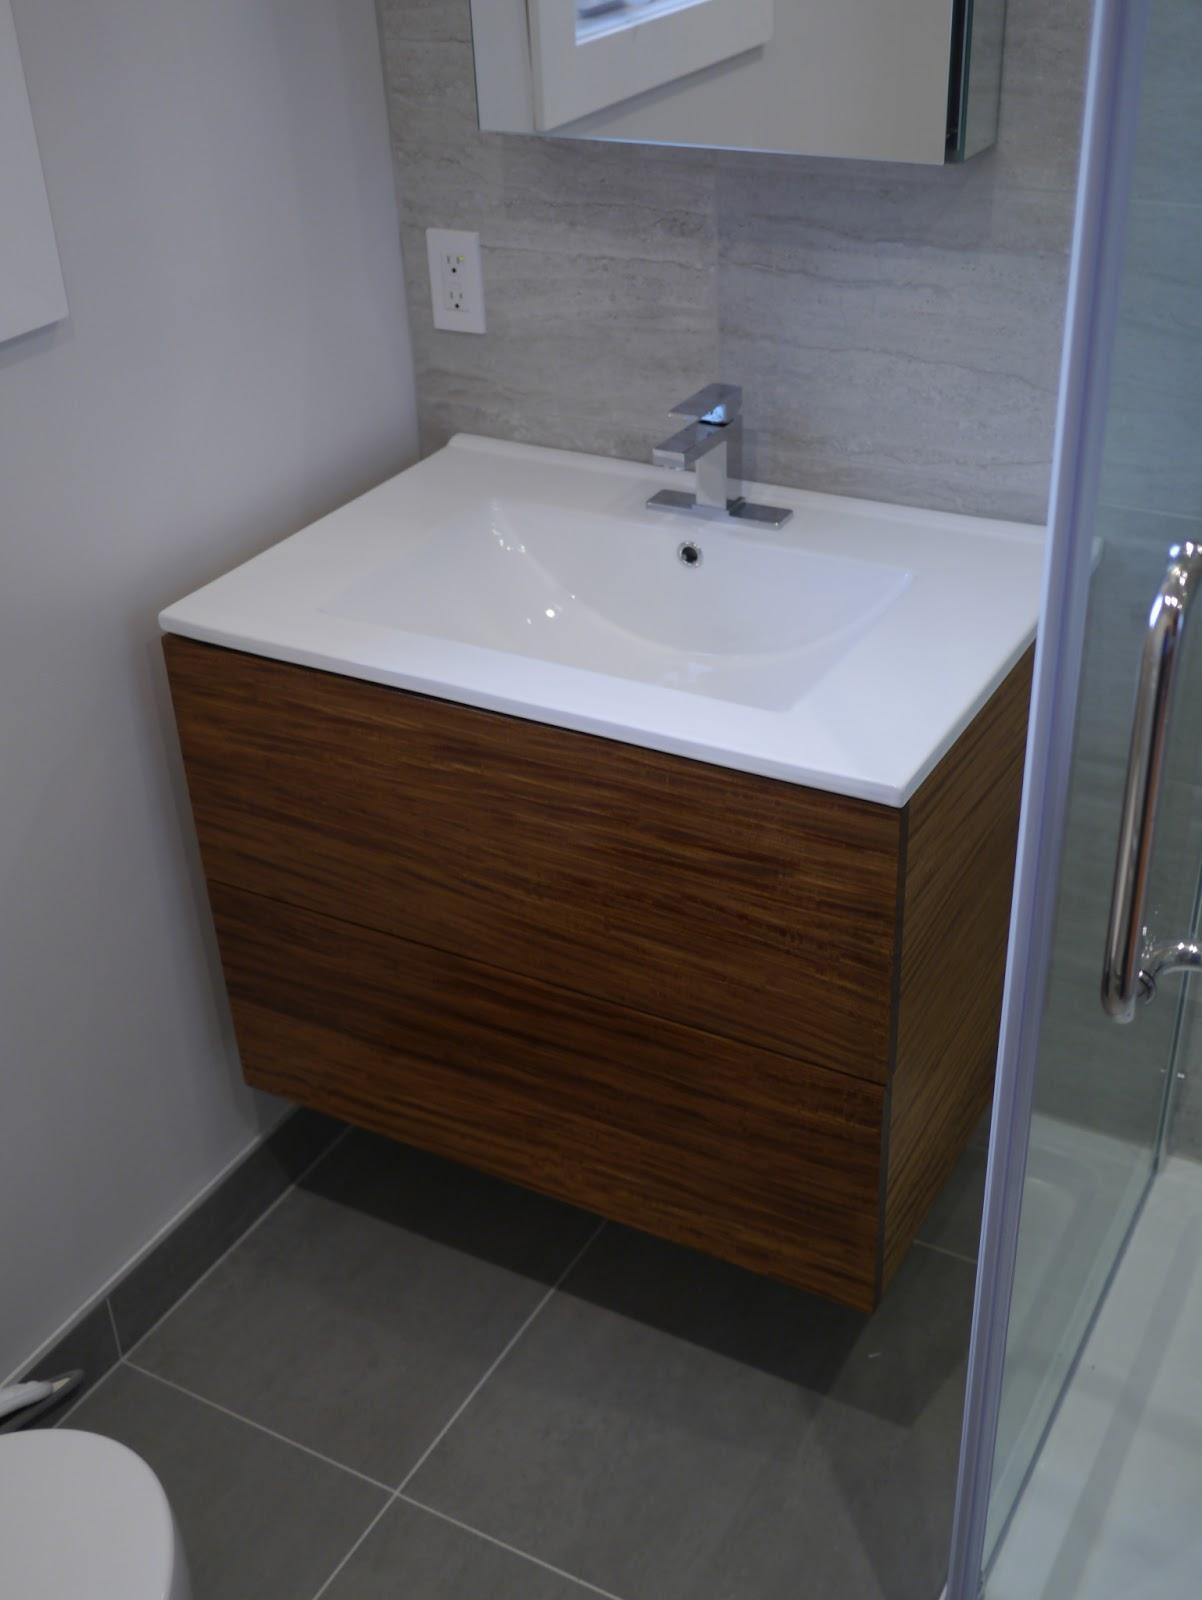 Vanite salle de bain moderne for Vanite salle de bain ikea